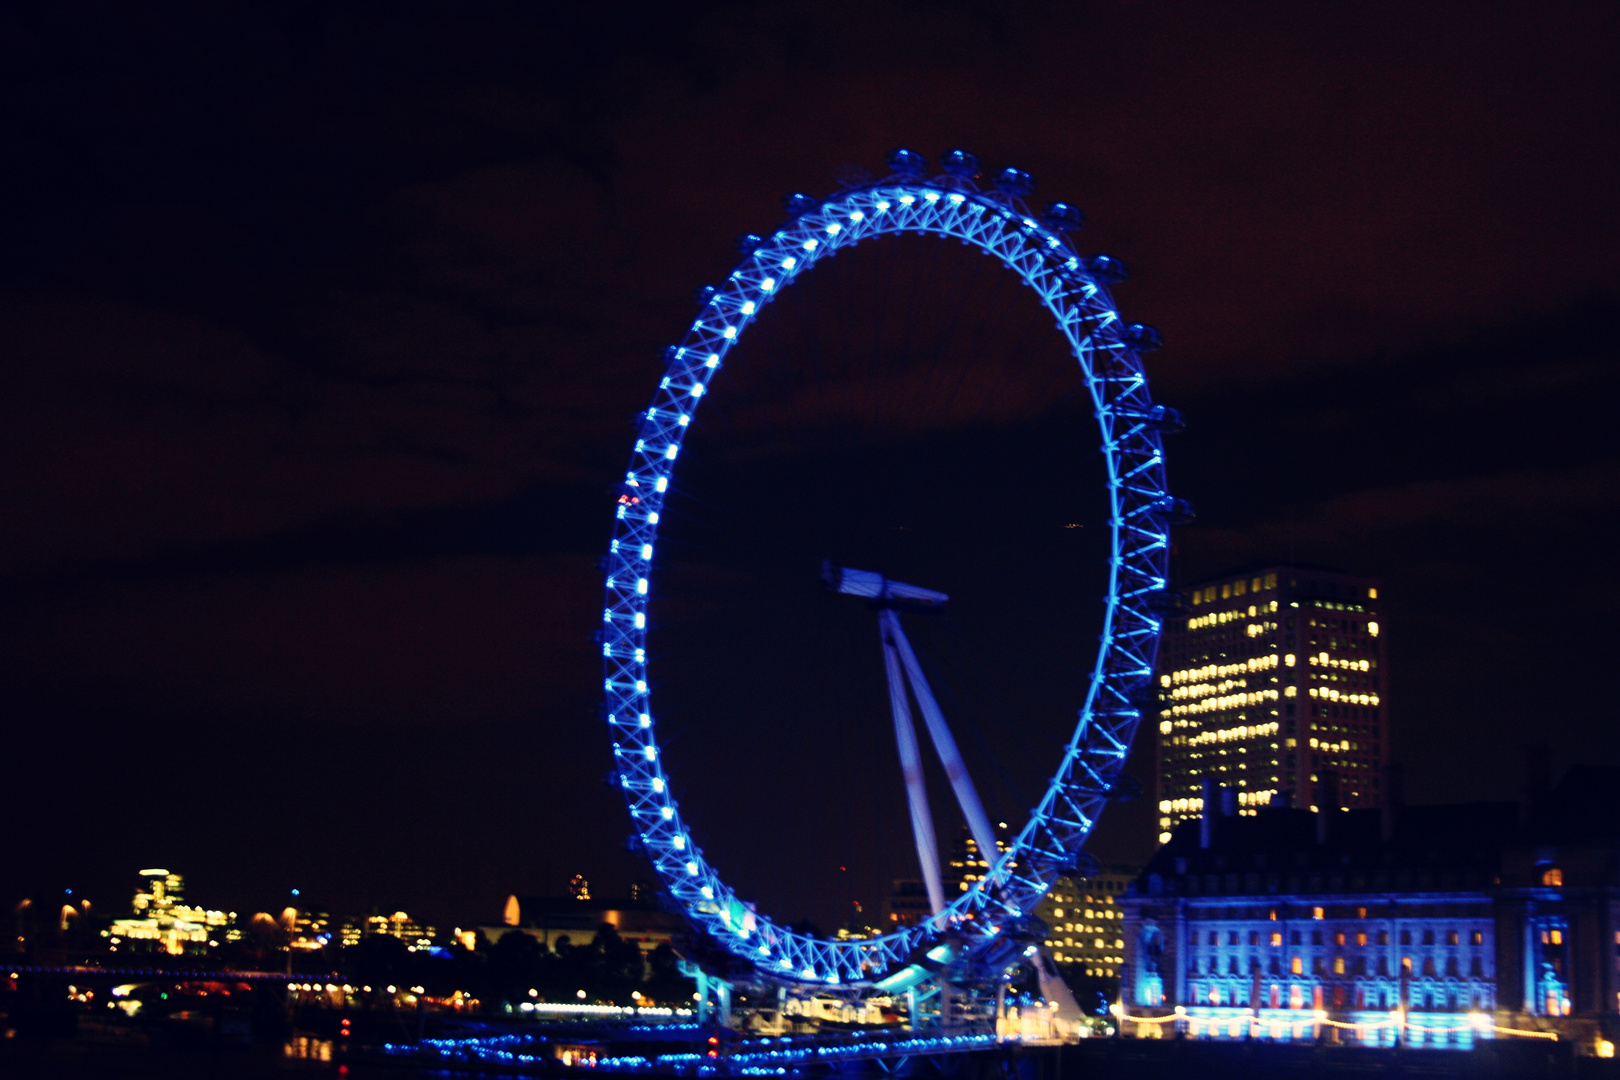 London - Eye